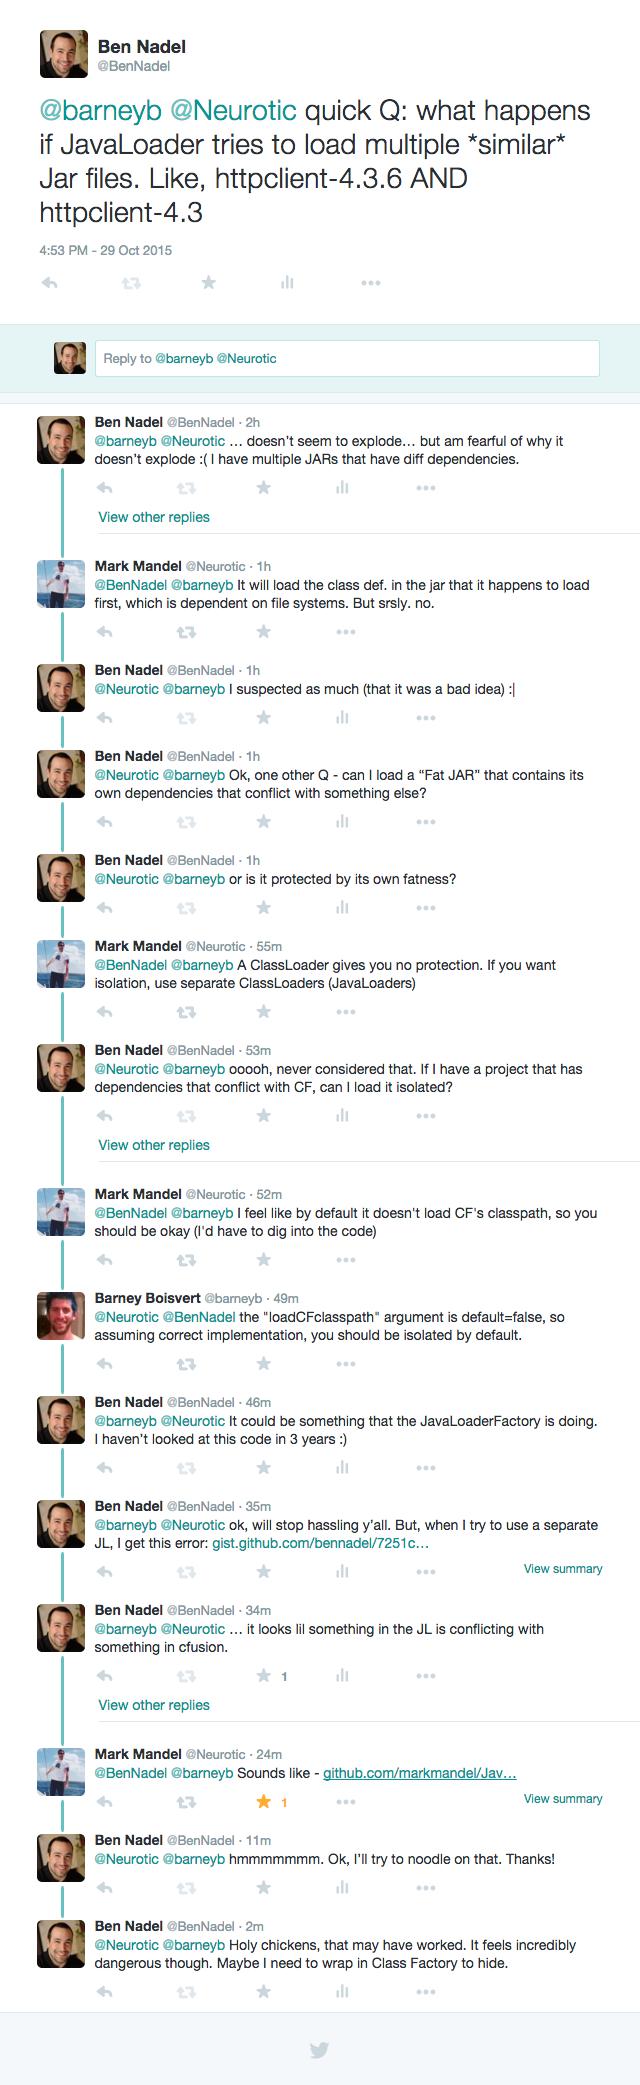 JavaLoader tweet conversation with Mark Mandel and Barney Boisvert.